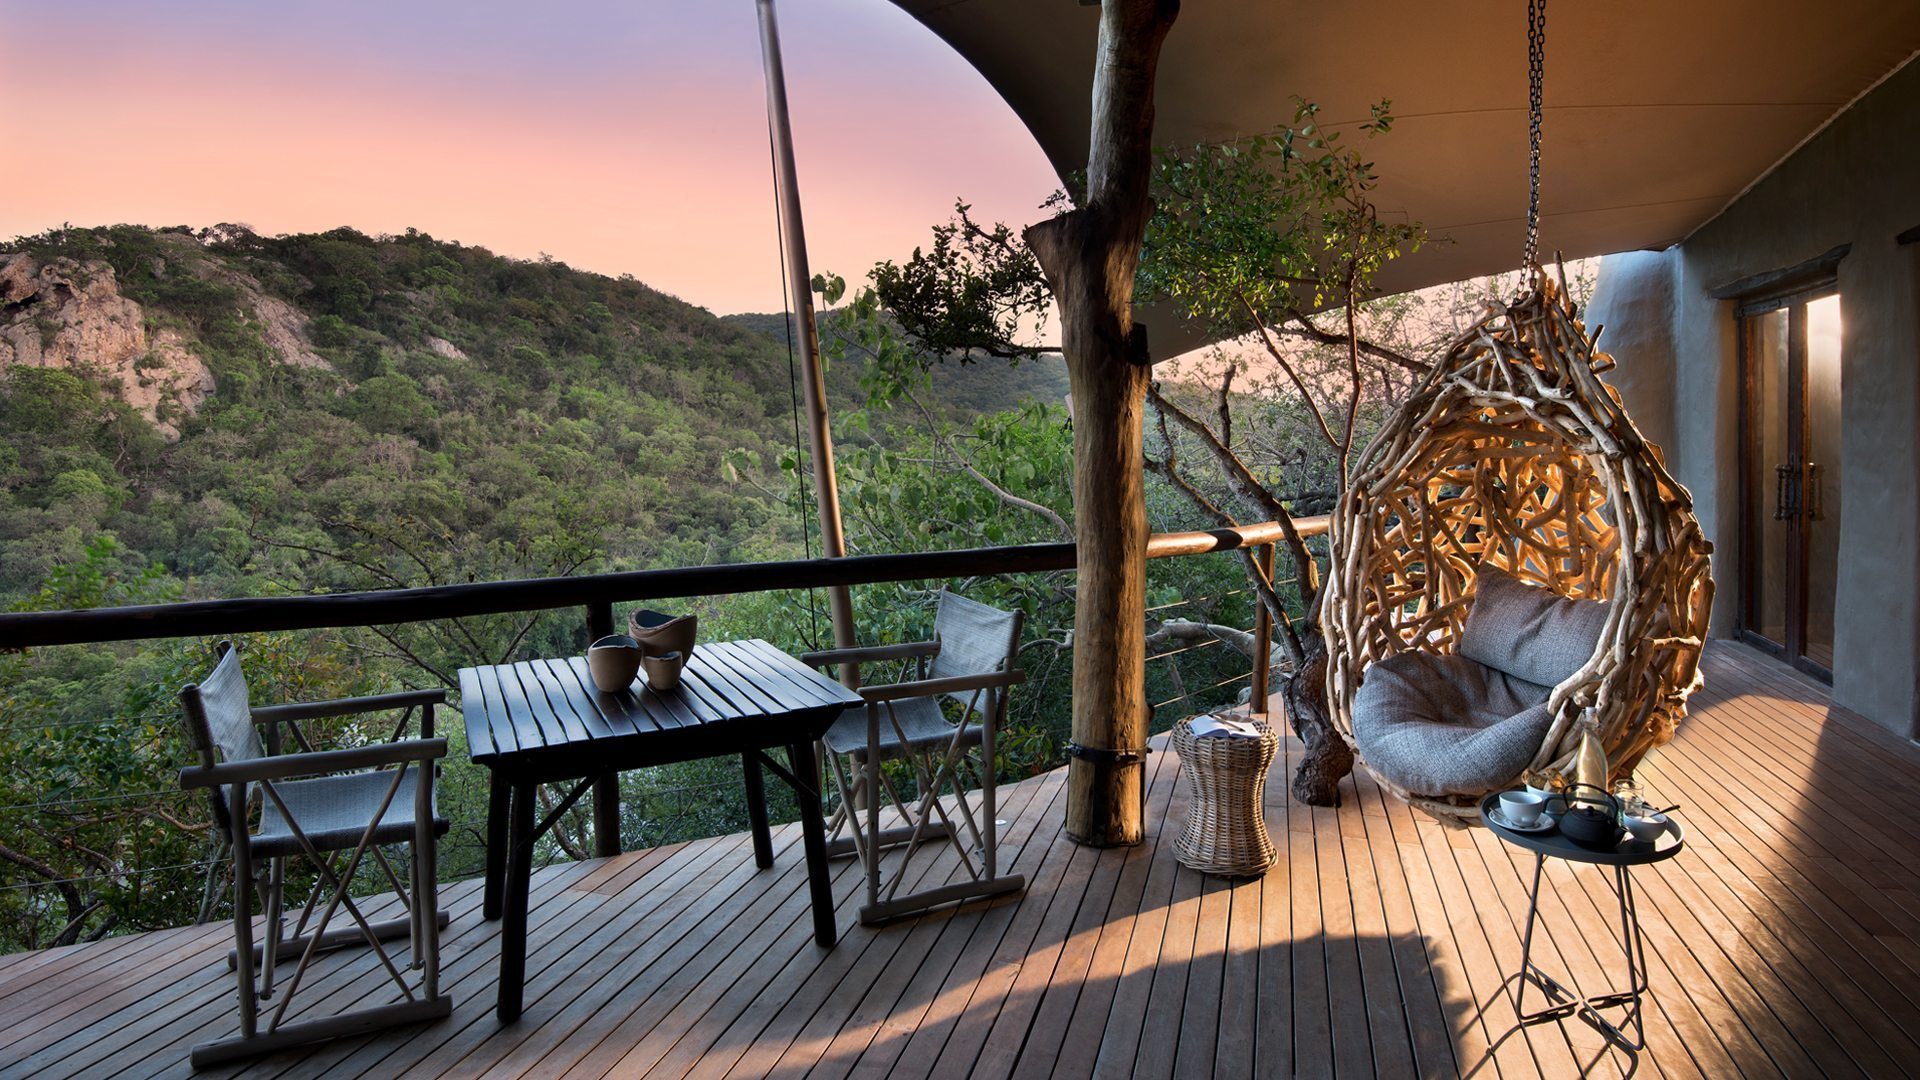 phinda-rock-lodge-deck-views-dining-luxury-safari-south-africa.jpg